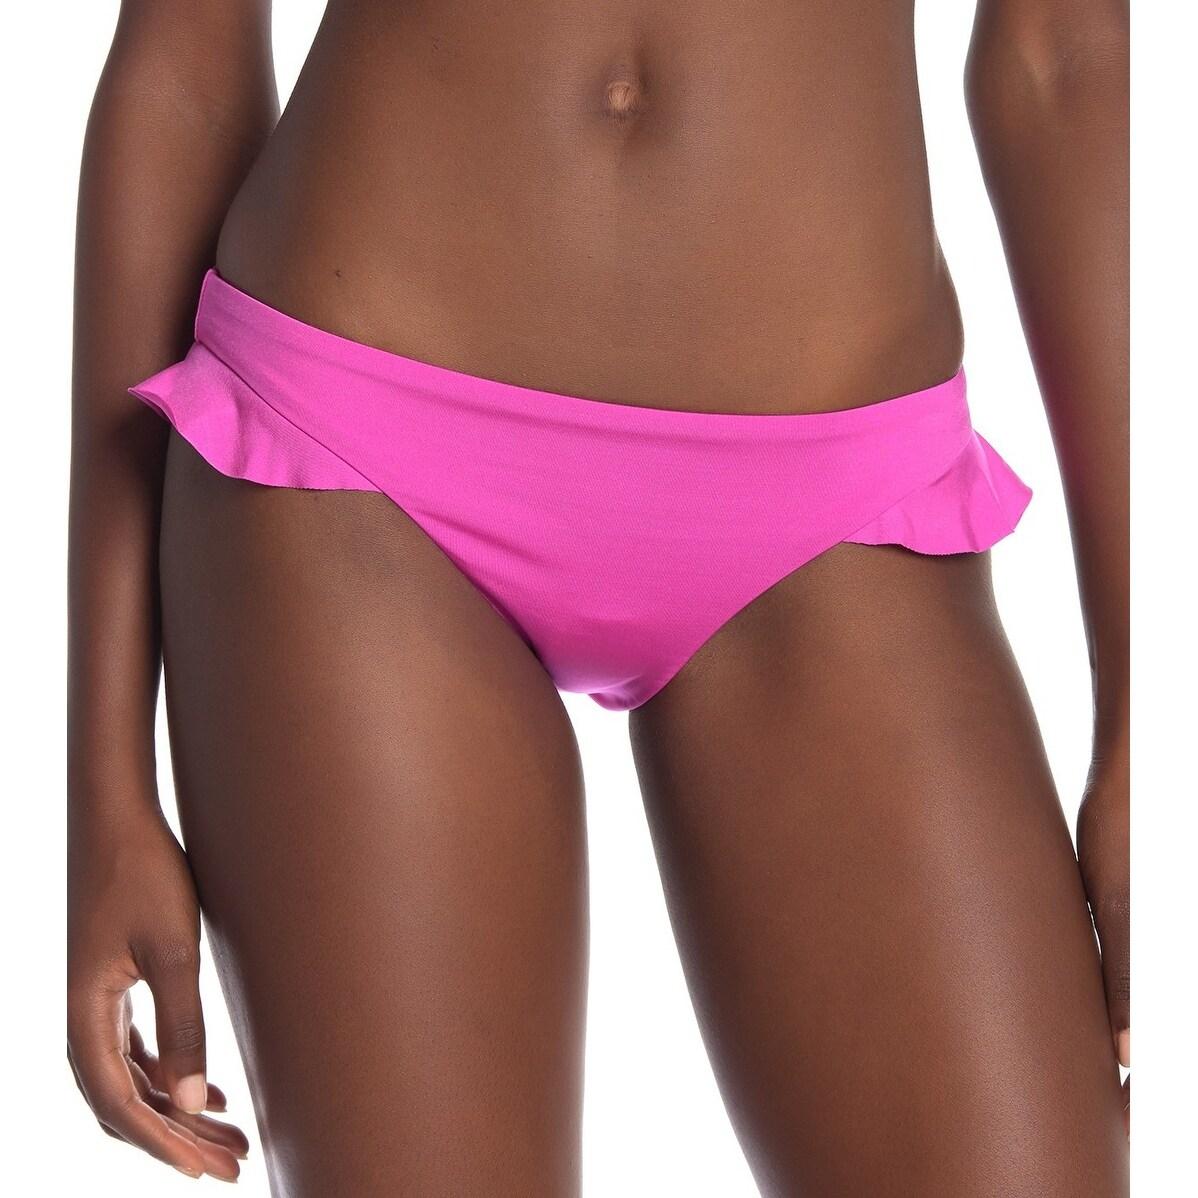 bd81eef5fd2 Buy Pink Swim Separates Online at Overstock | Our Best Swimwear Deals